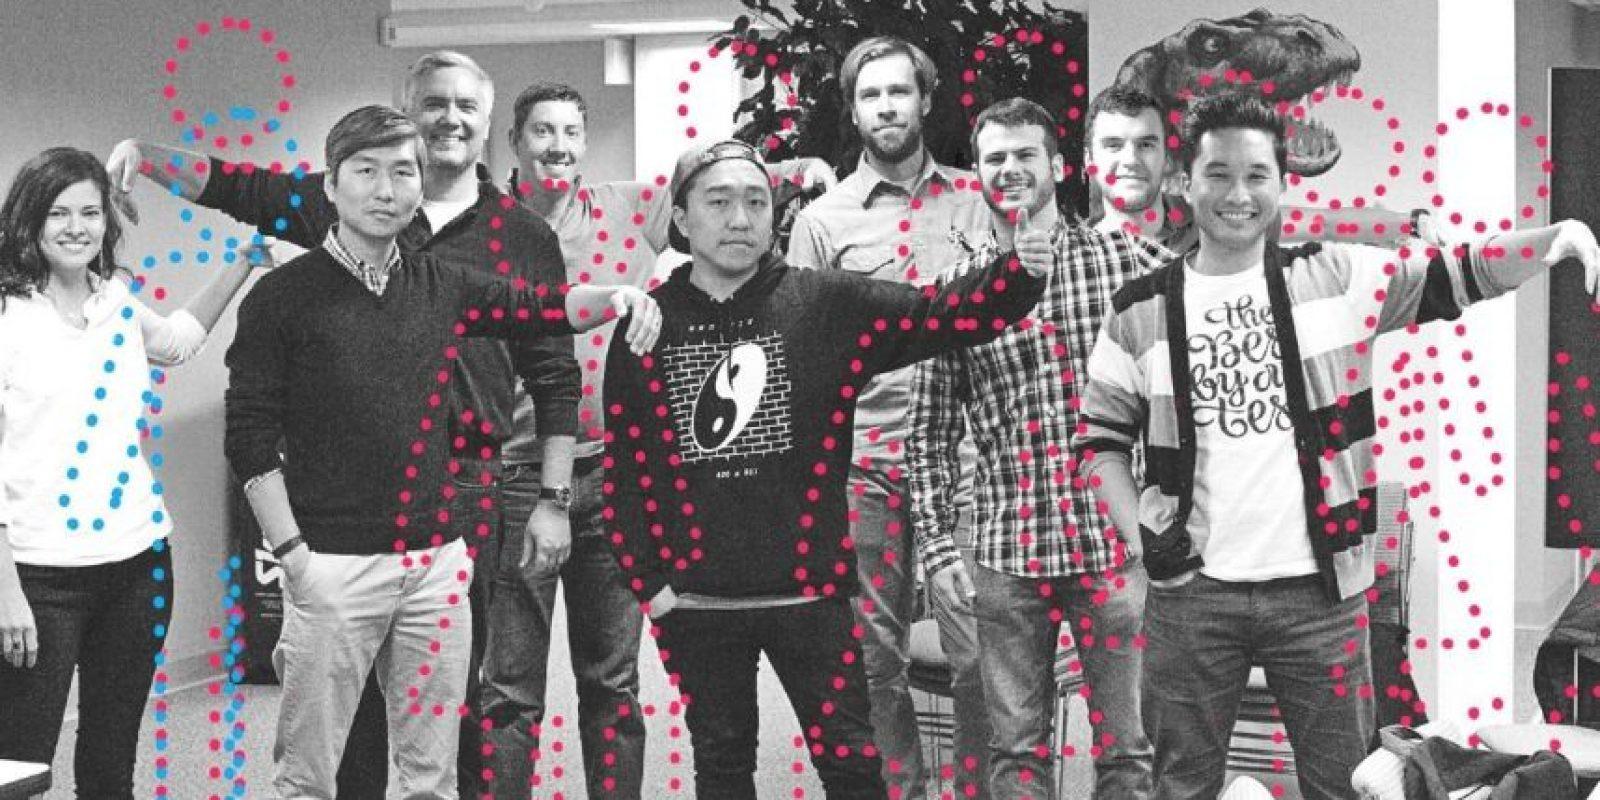 El estadounidense, Matt Homann, creó un sitio especial para solteros que quieren (únicamente) novio o novia cibernética. Foto:Vía Facebook.com/invisiblegirlfriend